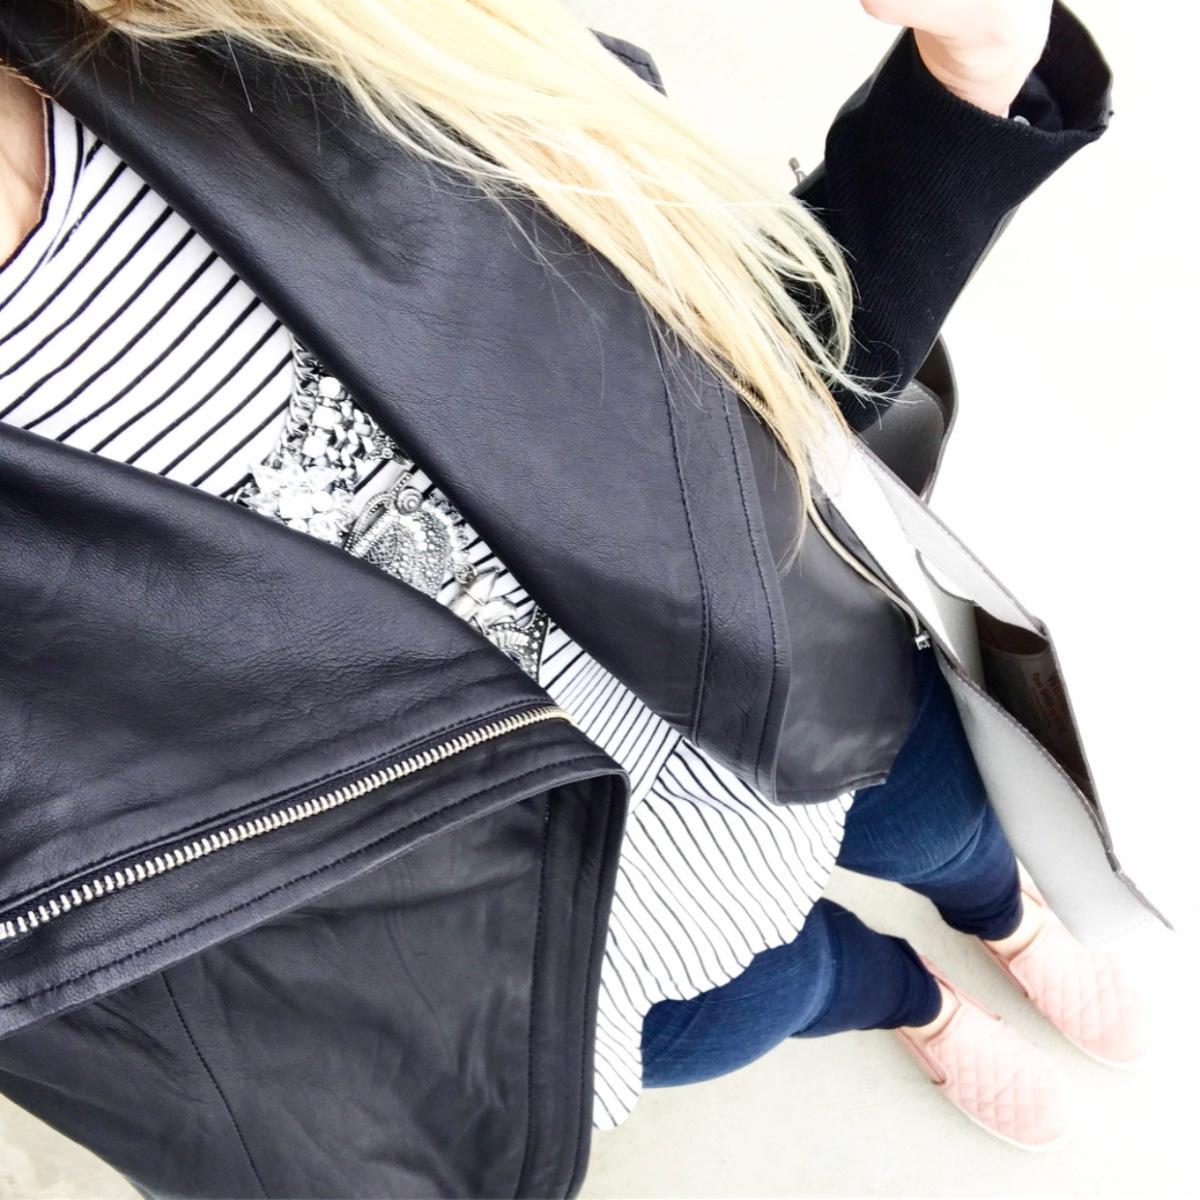 pretty, casual, leather jacket look |www.pearlsandsportsbras.com|